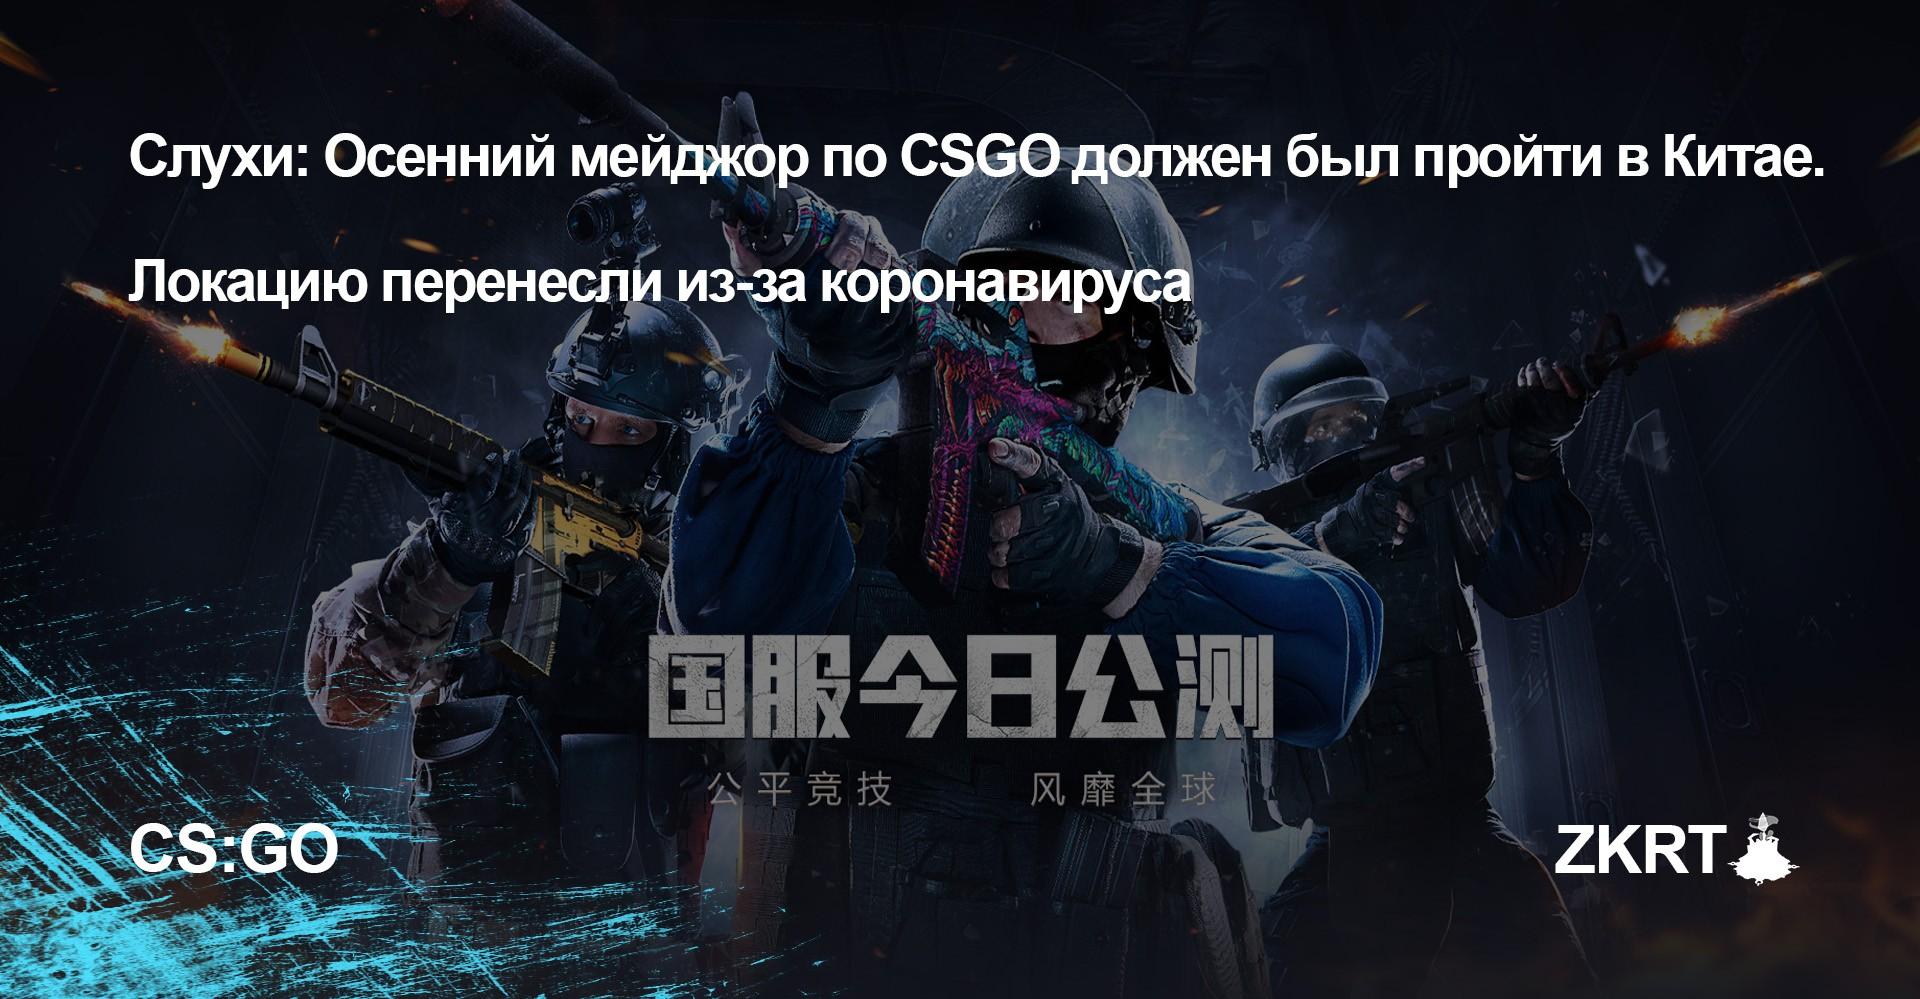 Csgo Major 2021